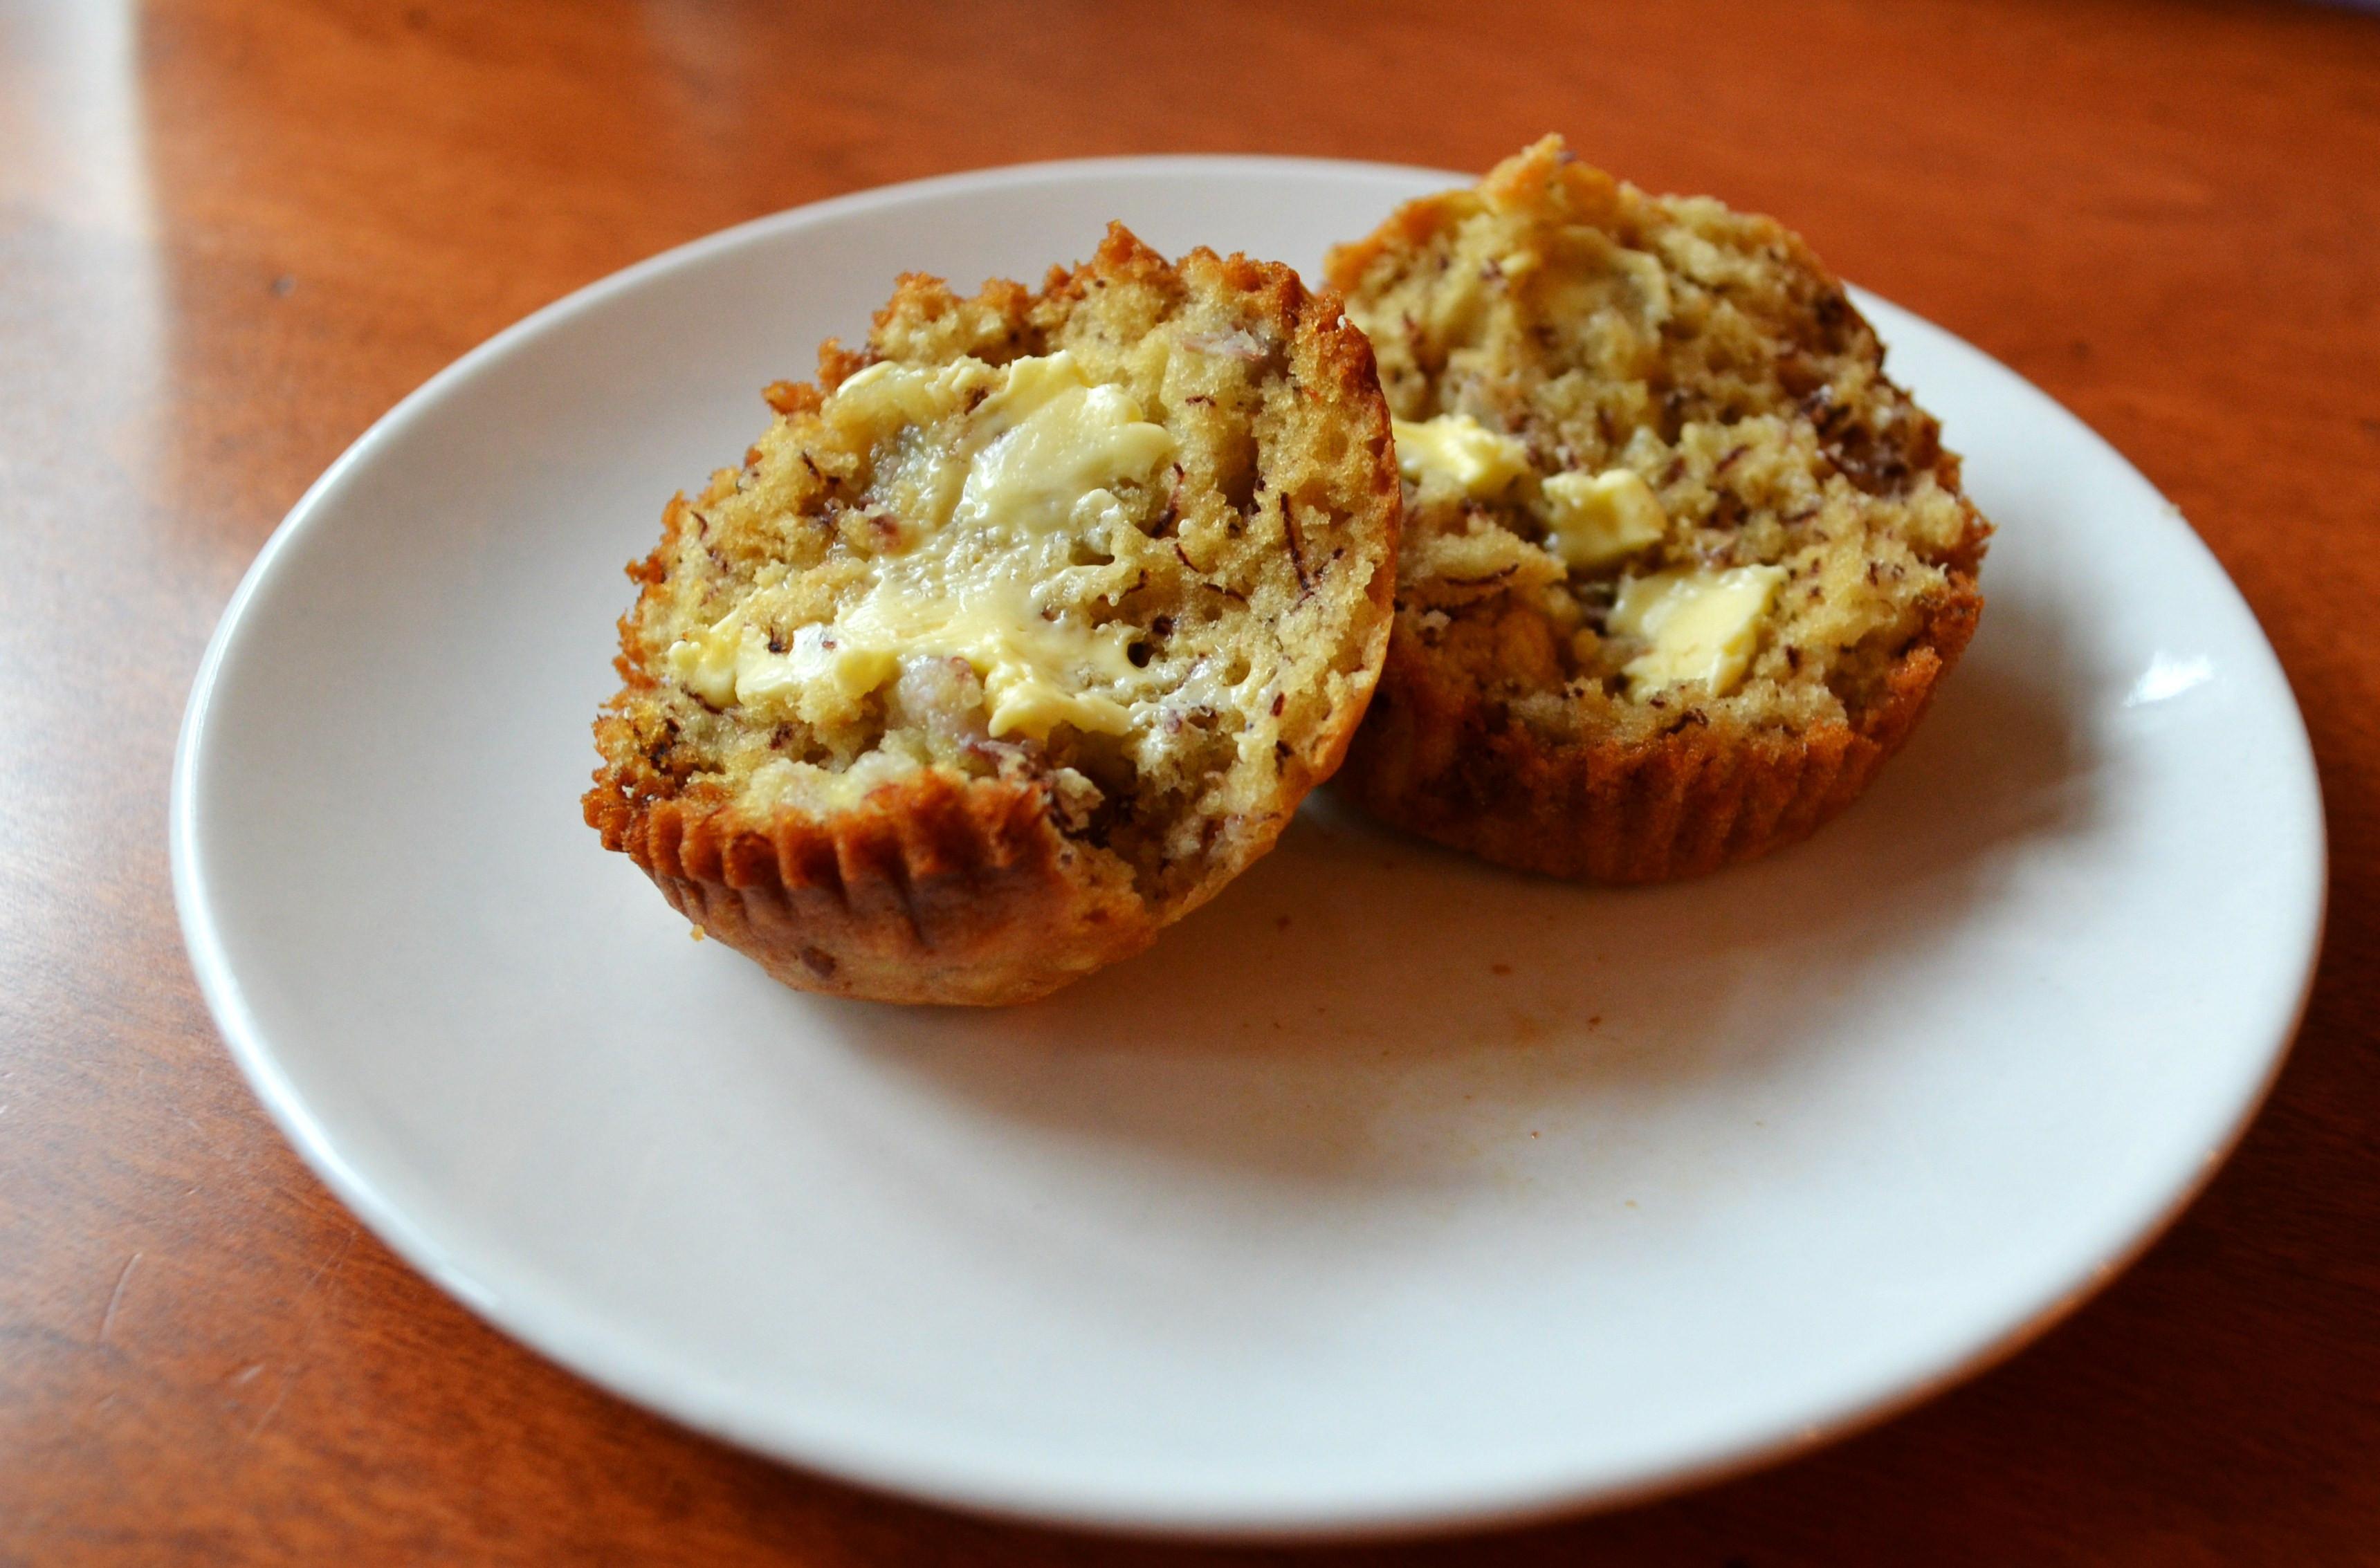 Best Banana Bread Muffins  Best Banana Bread and Muffins • Domestic Superhero